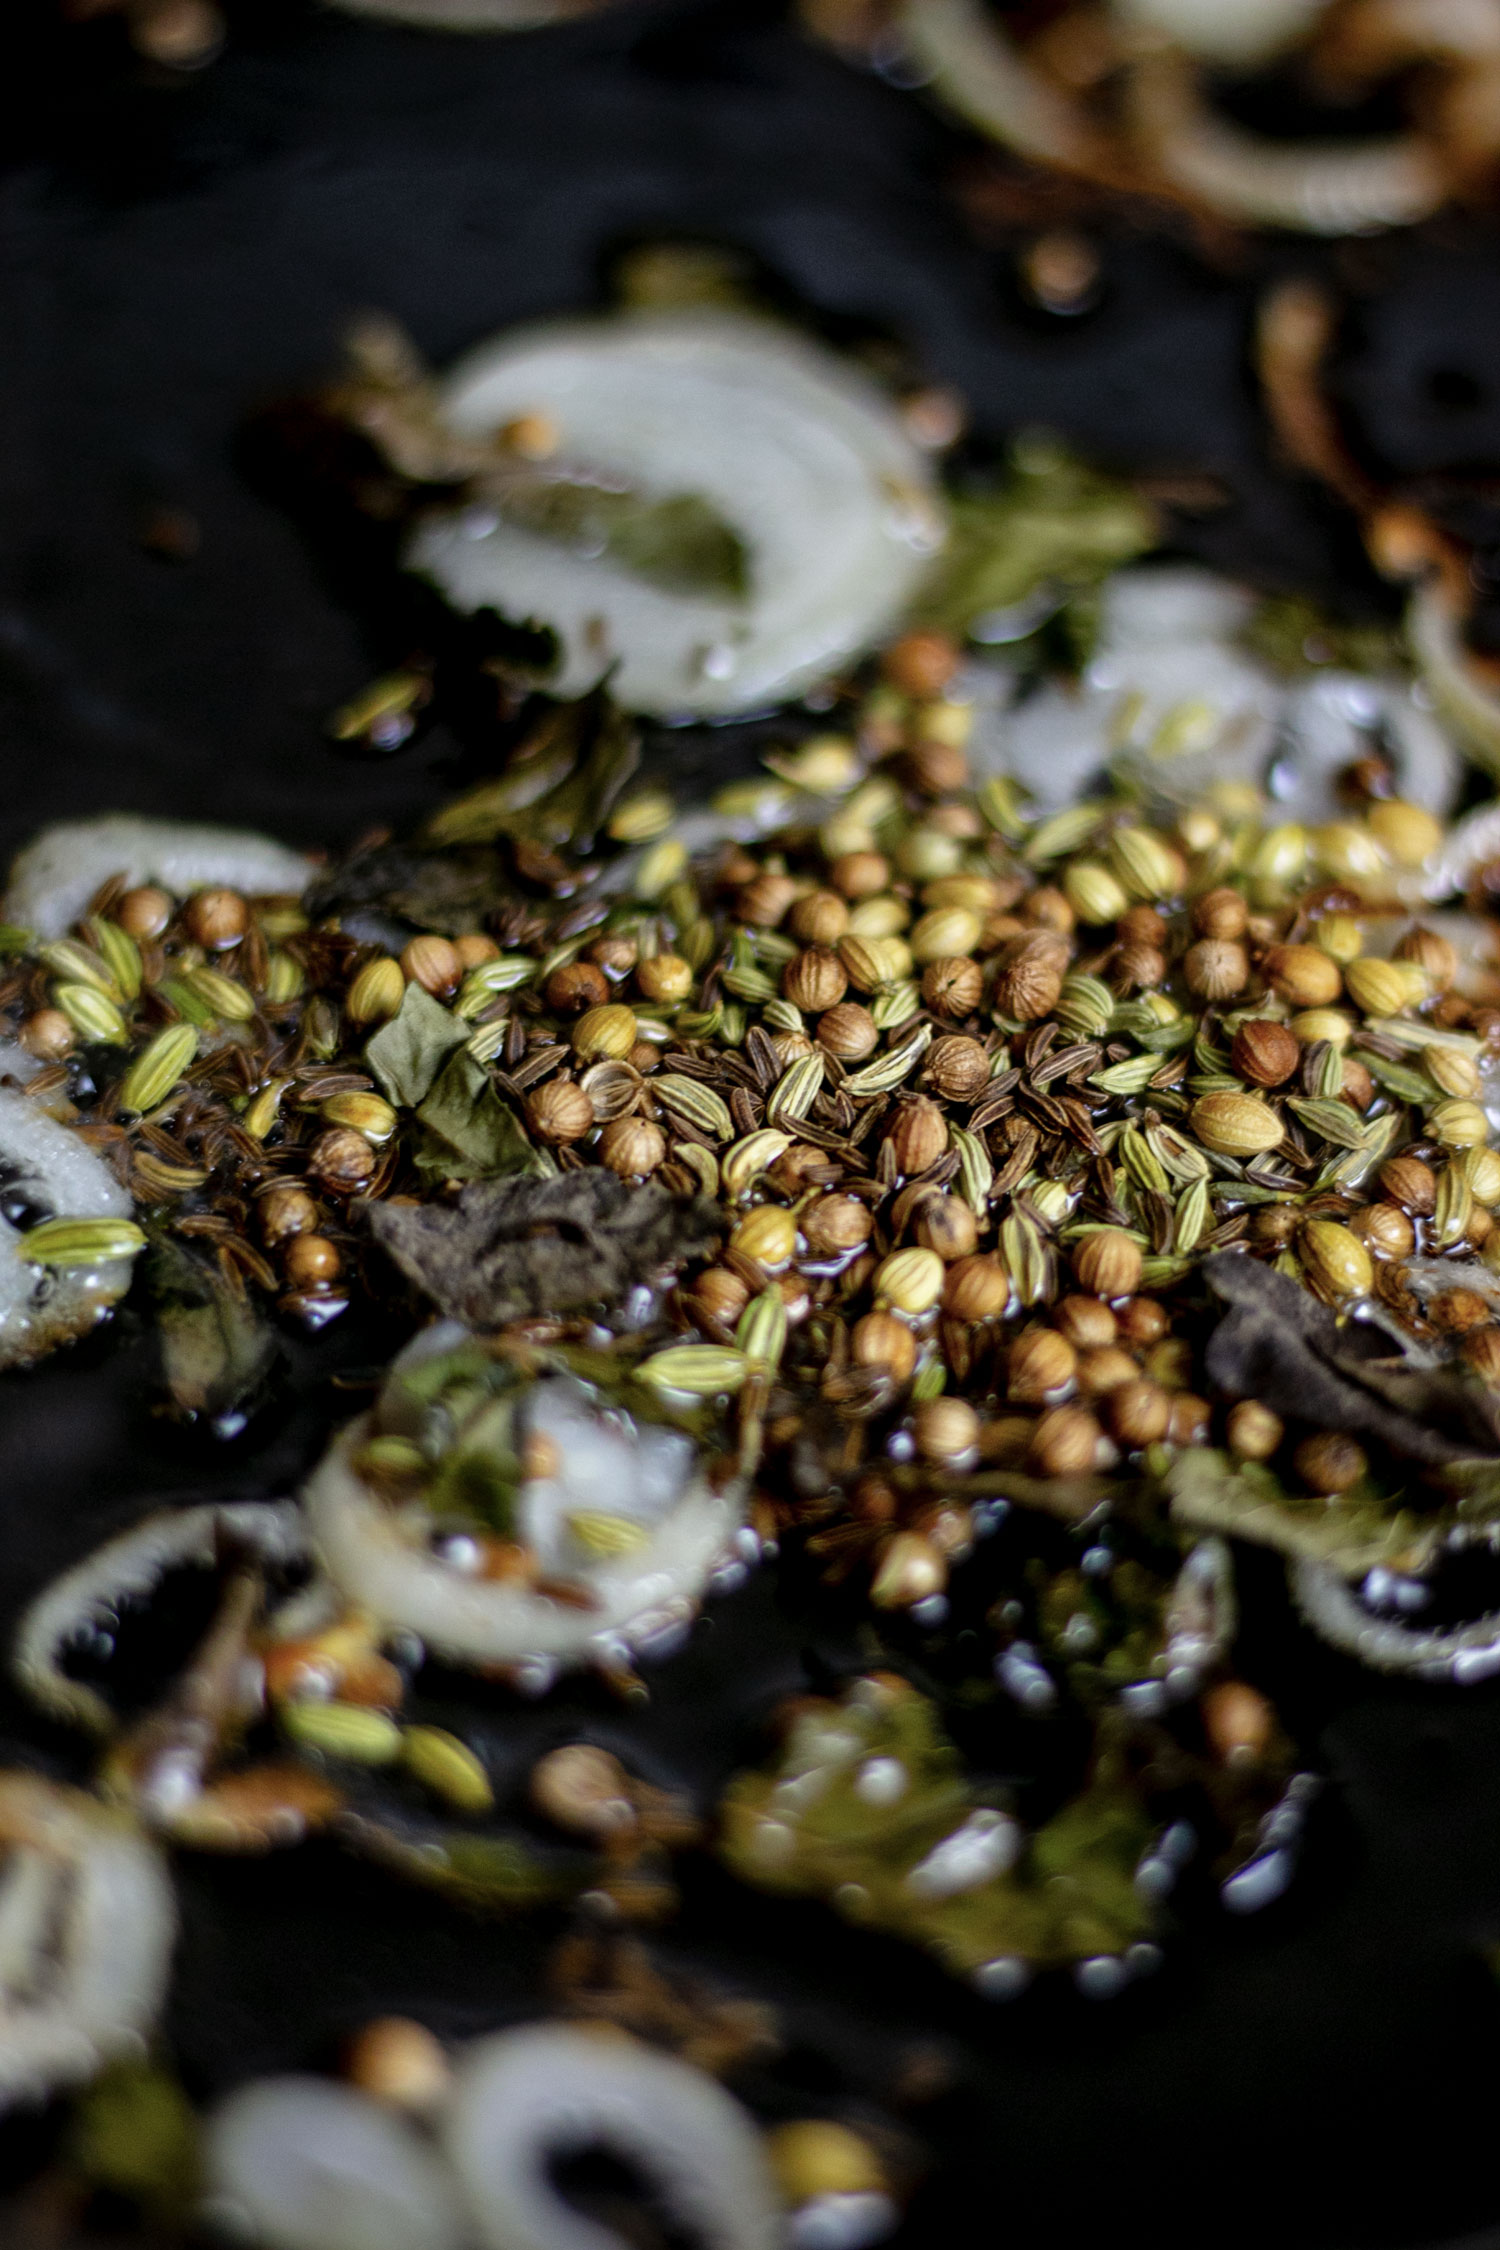 Graines de coriandre, cumin, fenouil en train de rissoler